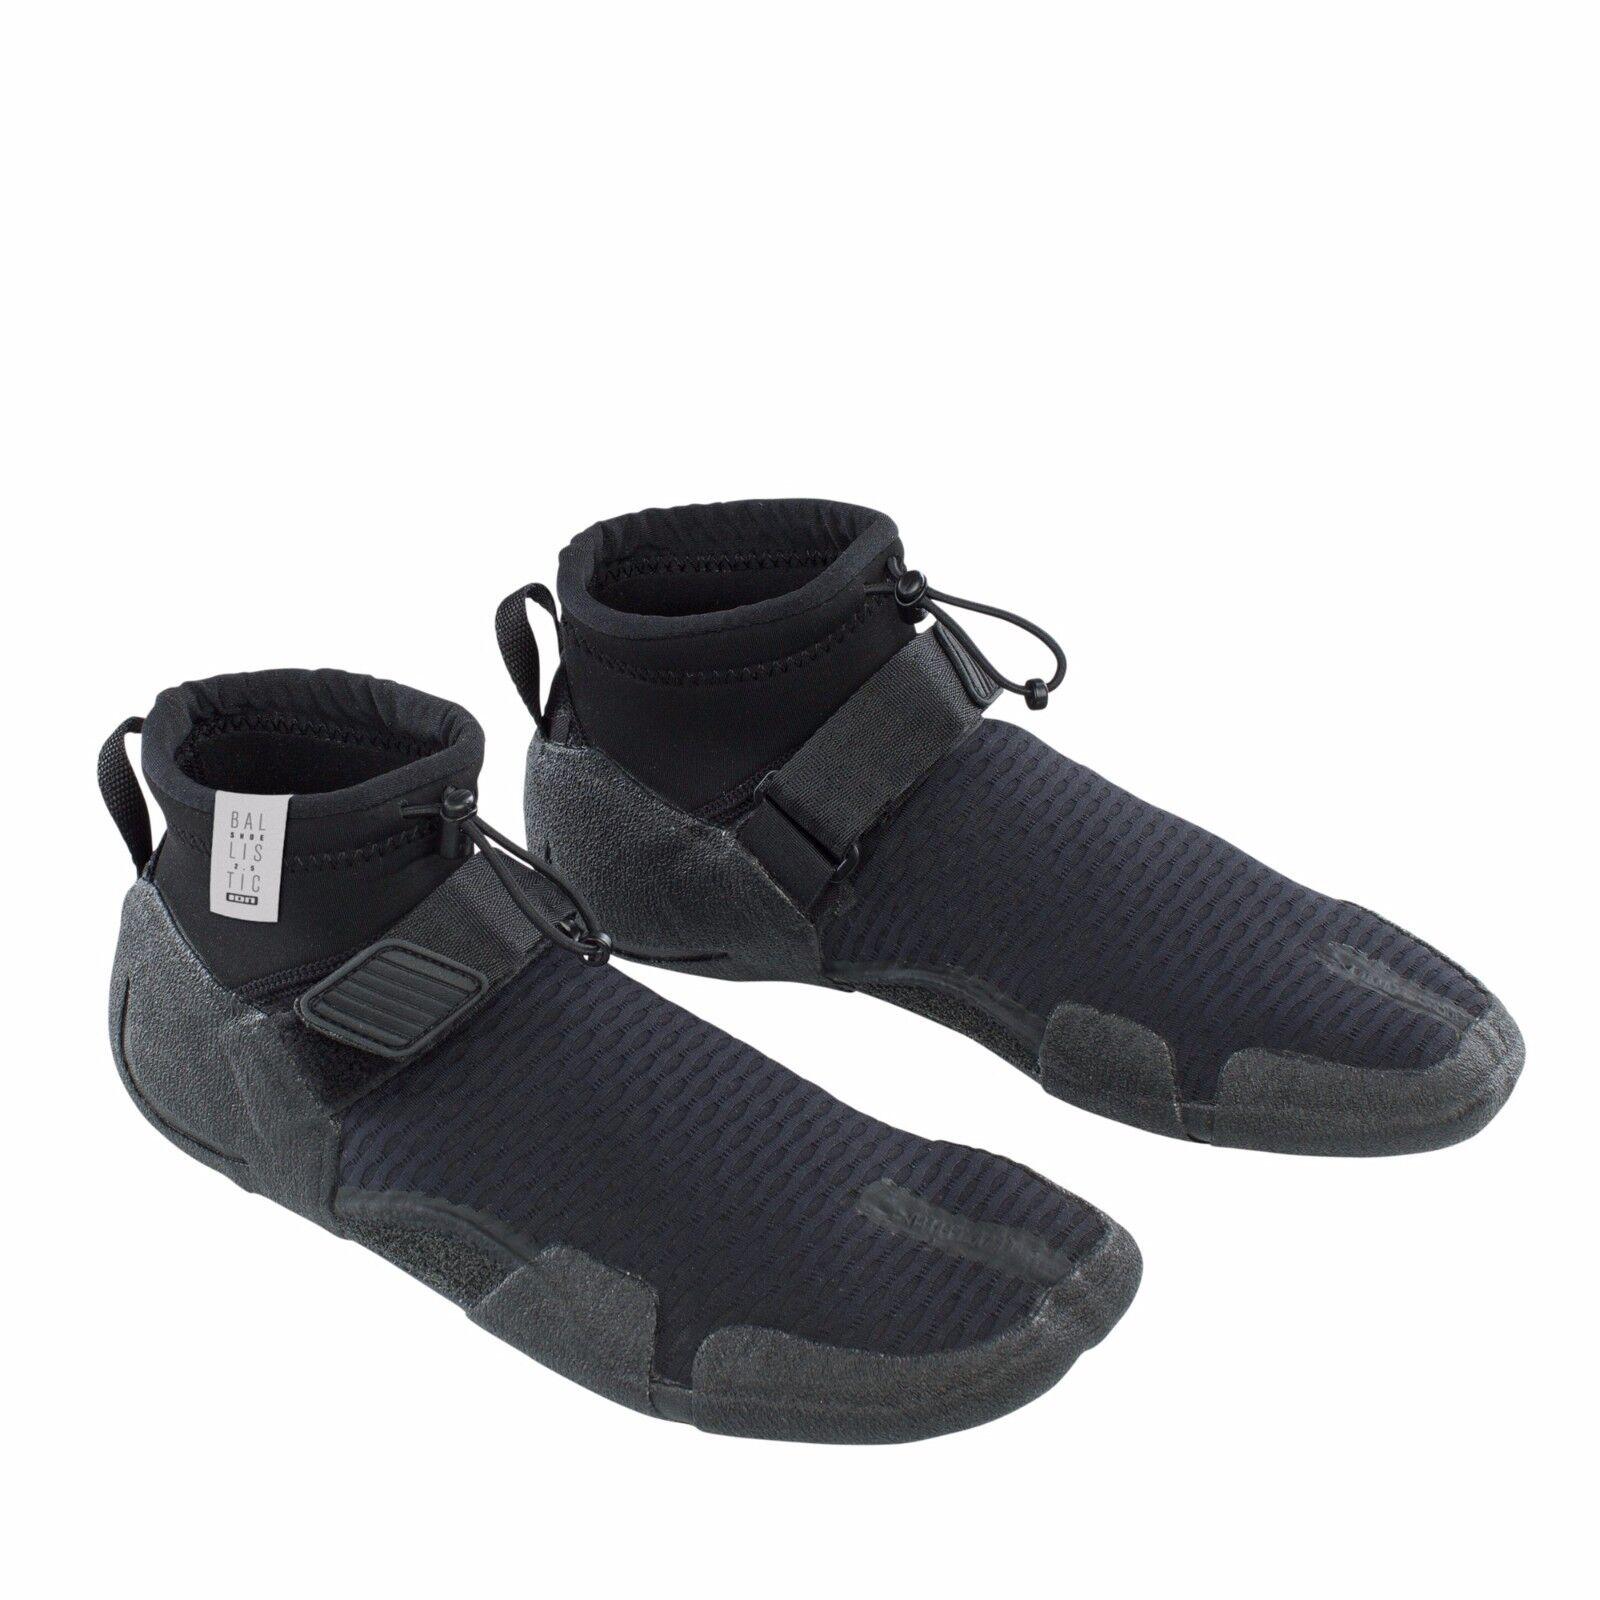 "ION Neoprenschuhe ""Ballistic Shoes 2.5"" 2018…  "